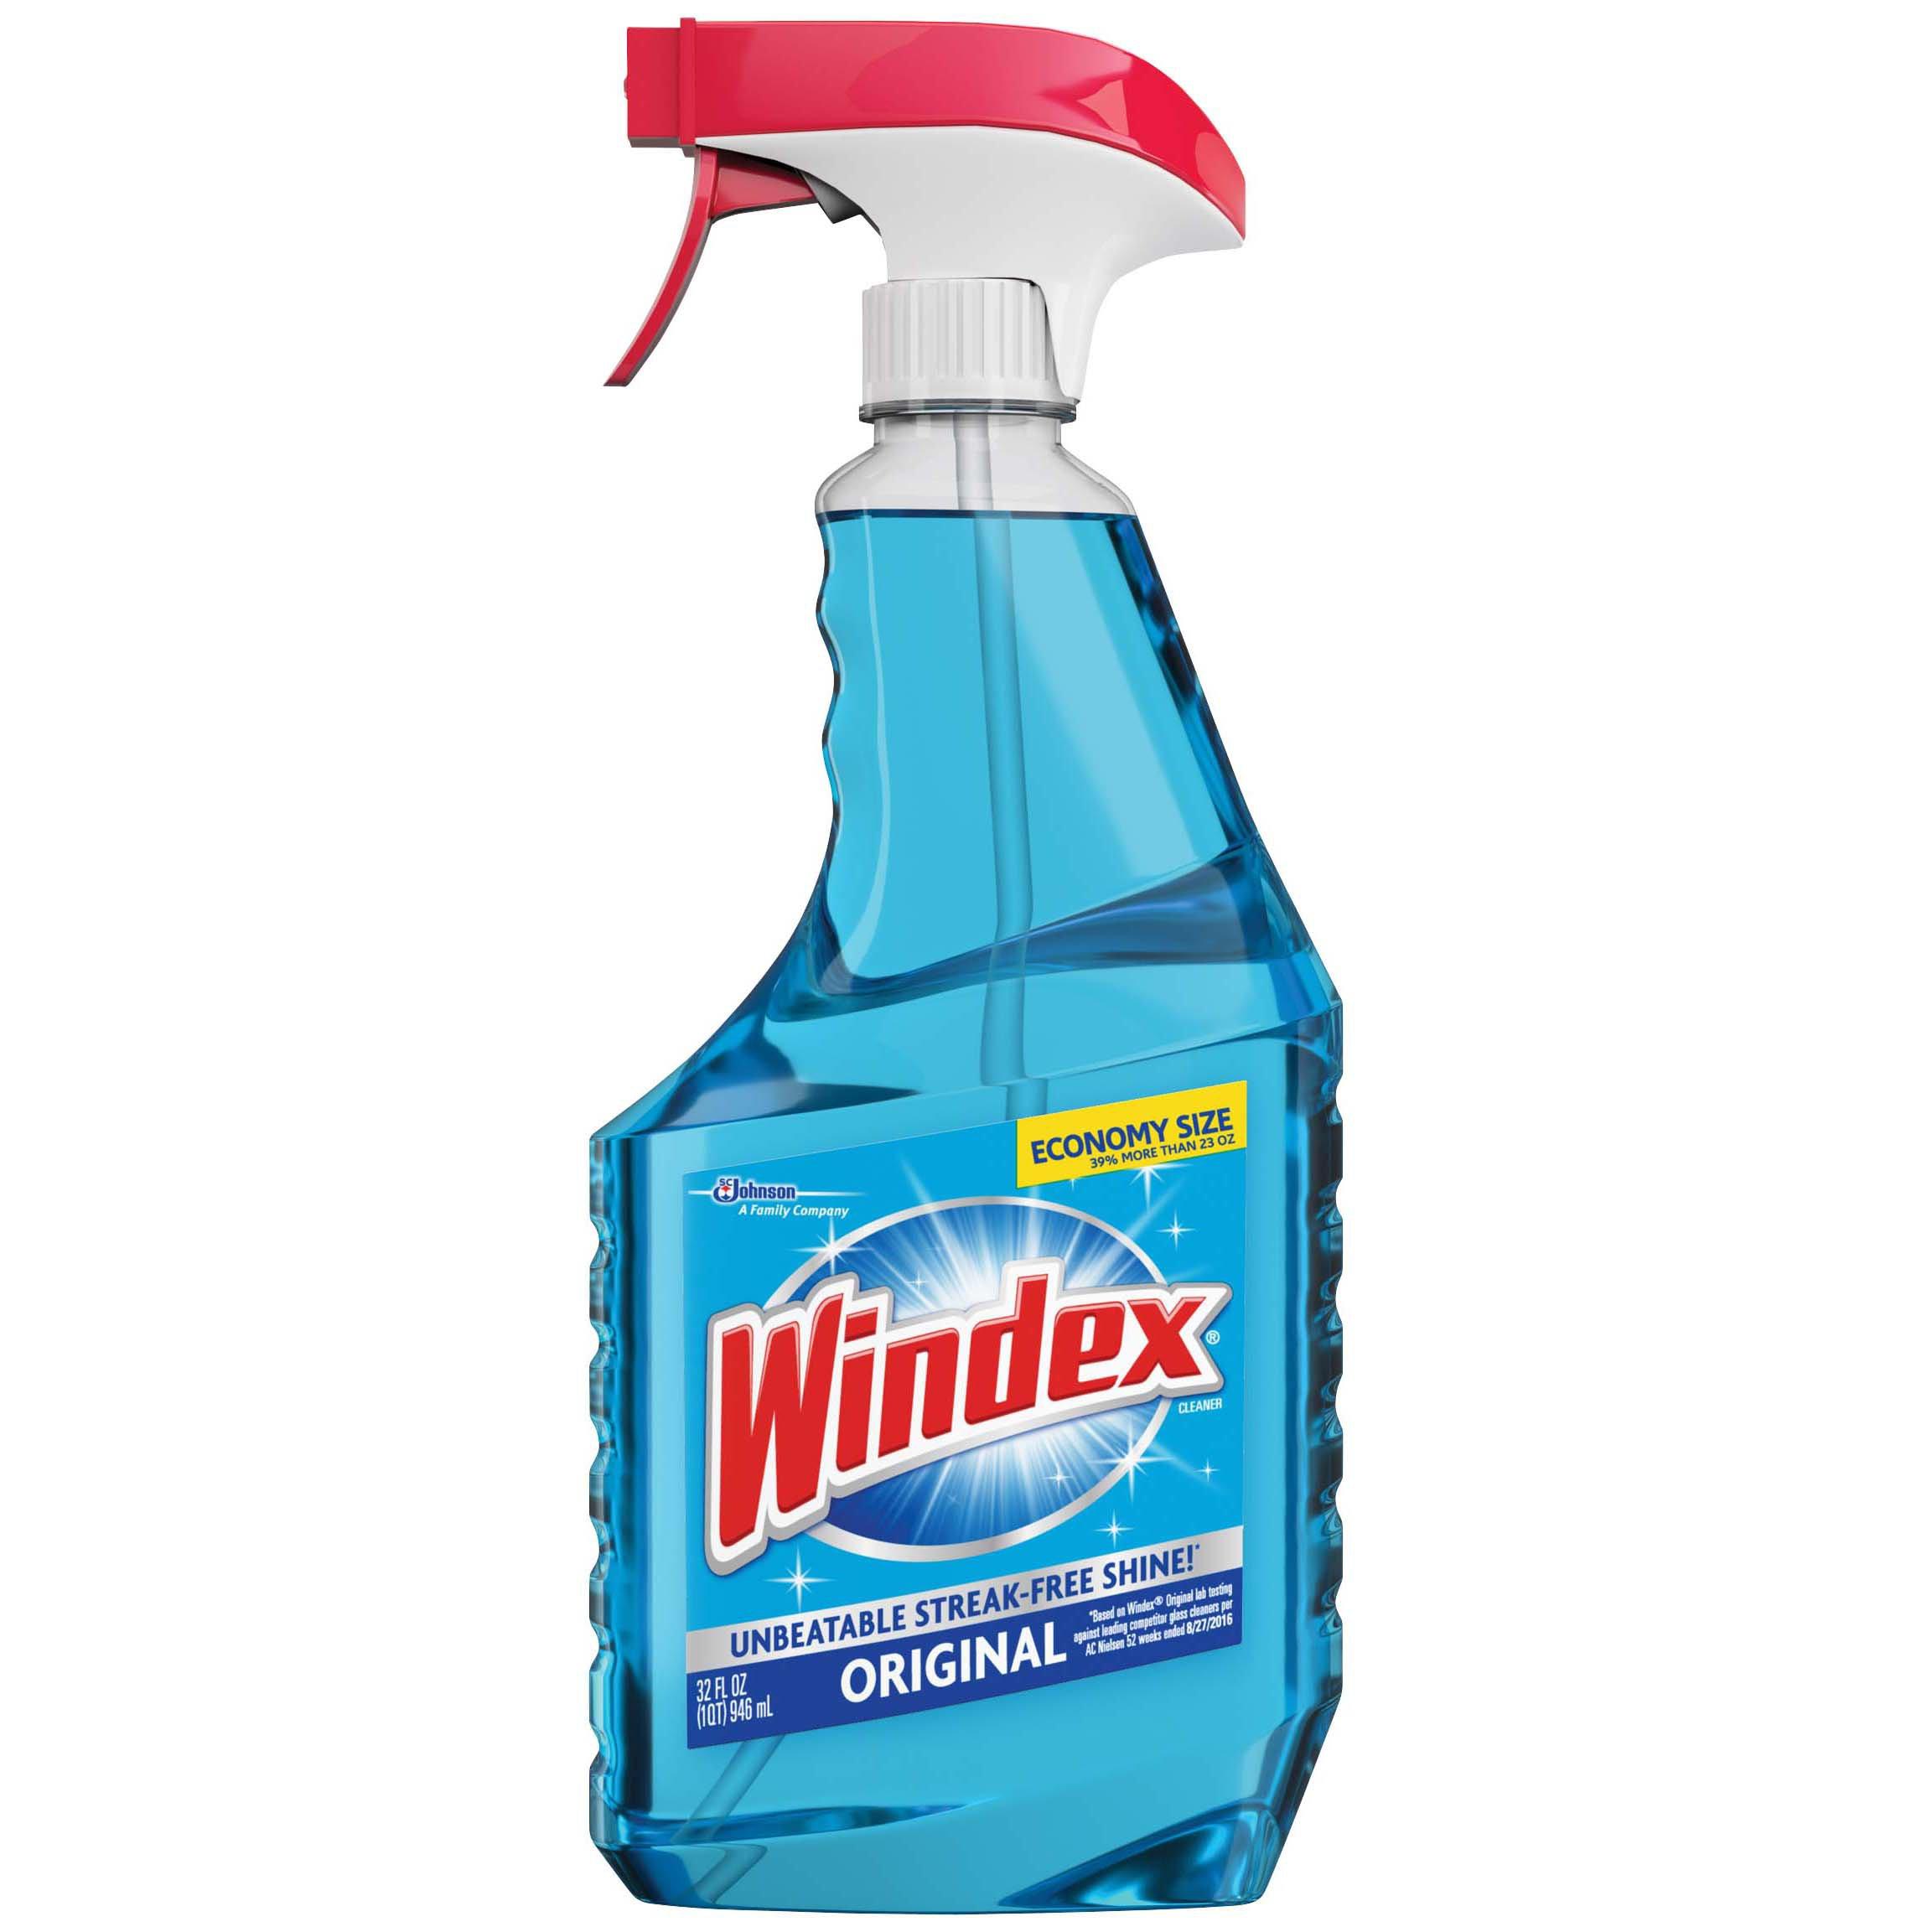 Windex Multi‑Purpose Original Cleaner ‑ Shop All Purpose Cleaners at H‑E‑B